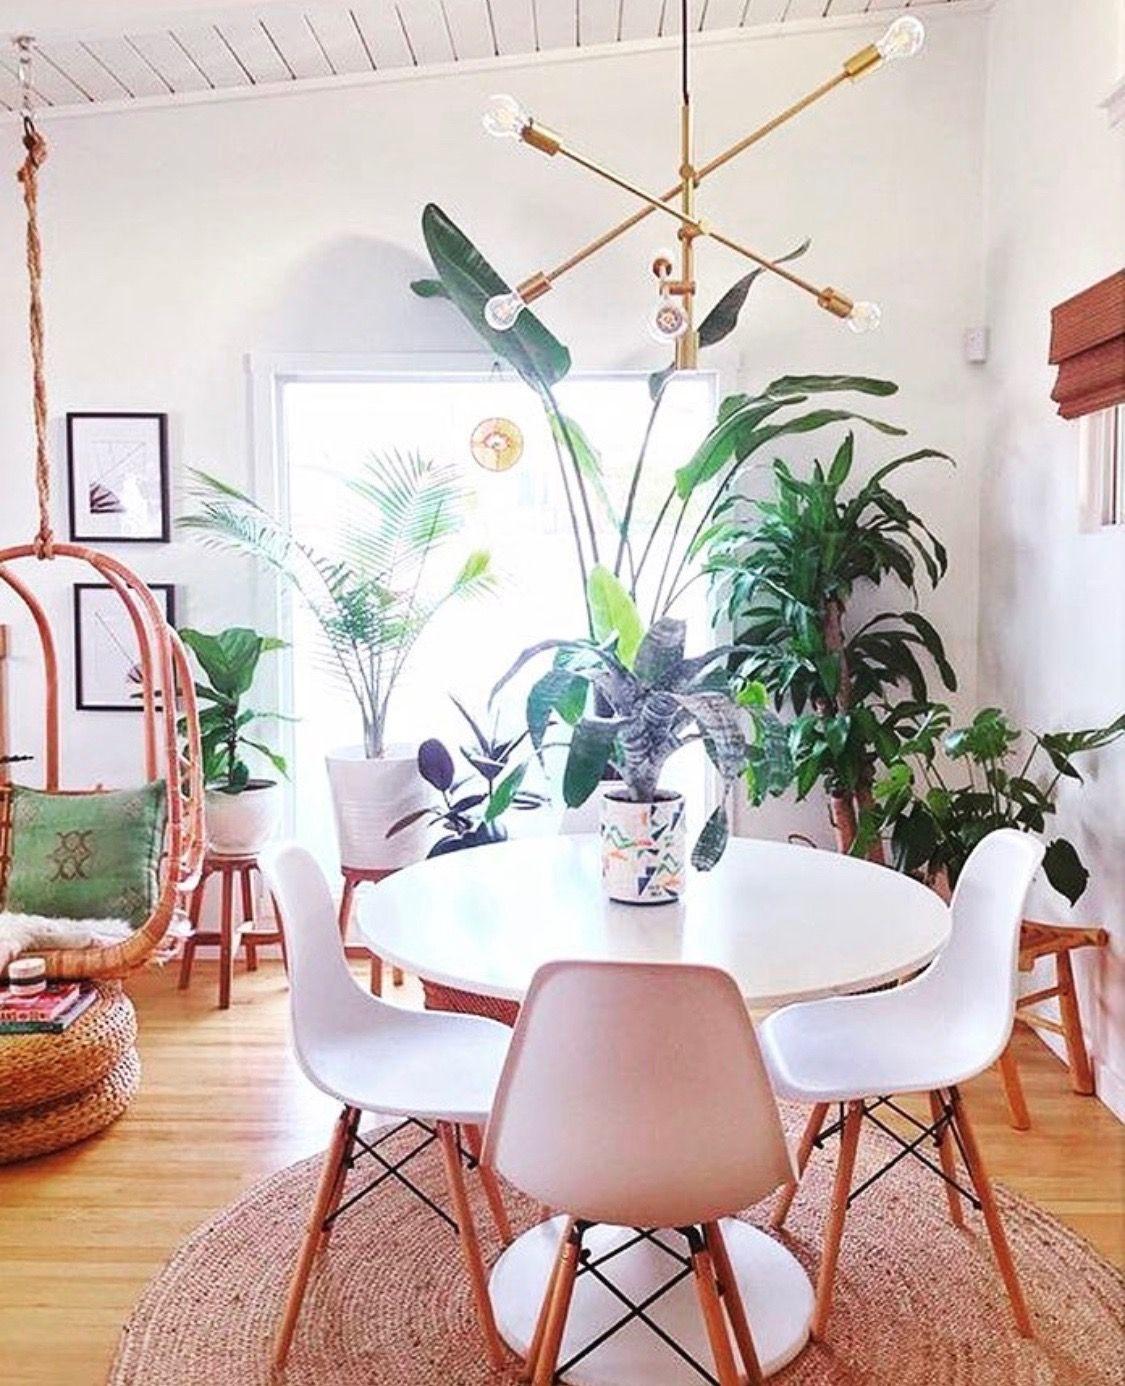 10 Boho Chic Kitchen Interior Design Ideas: Bohemian Dining Room Boho Home Decor